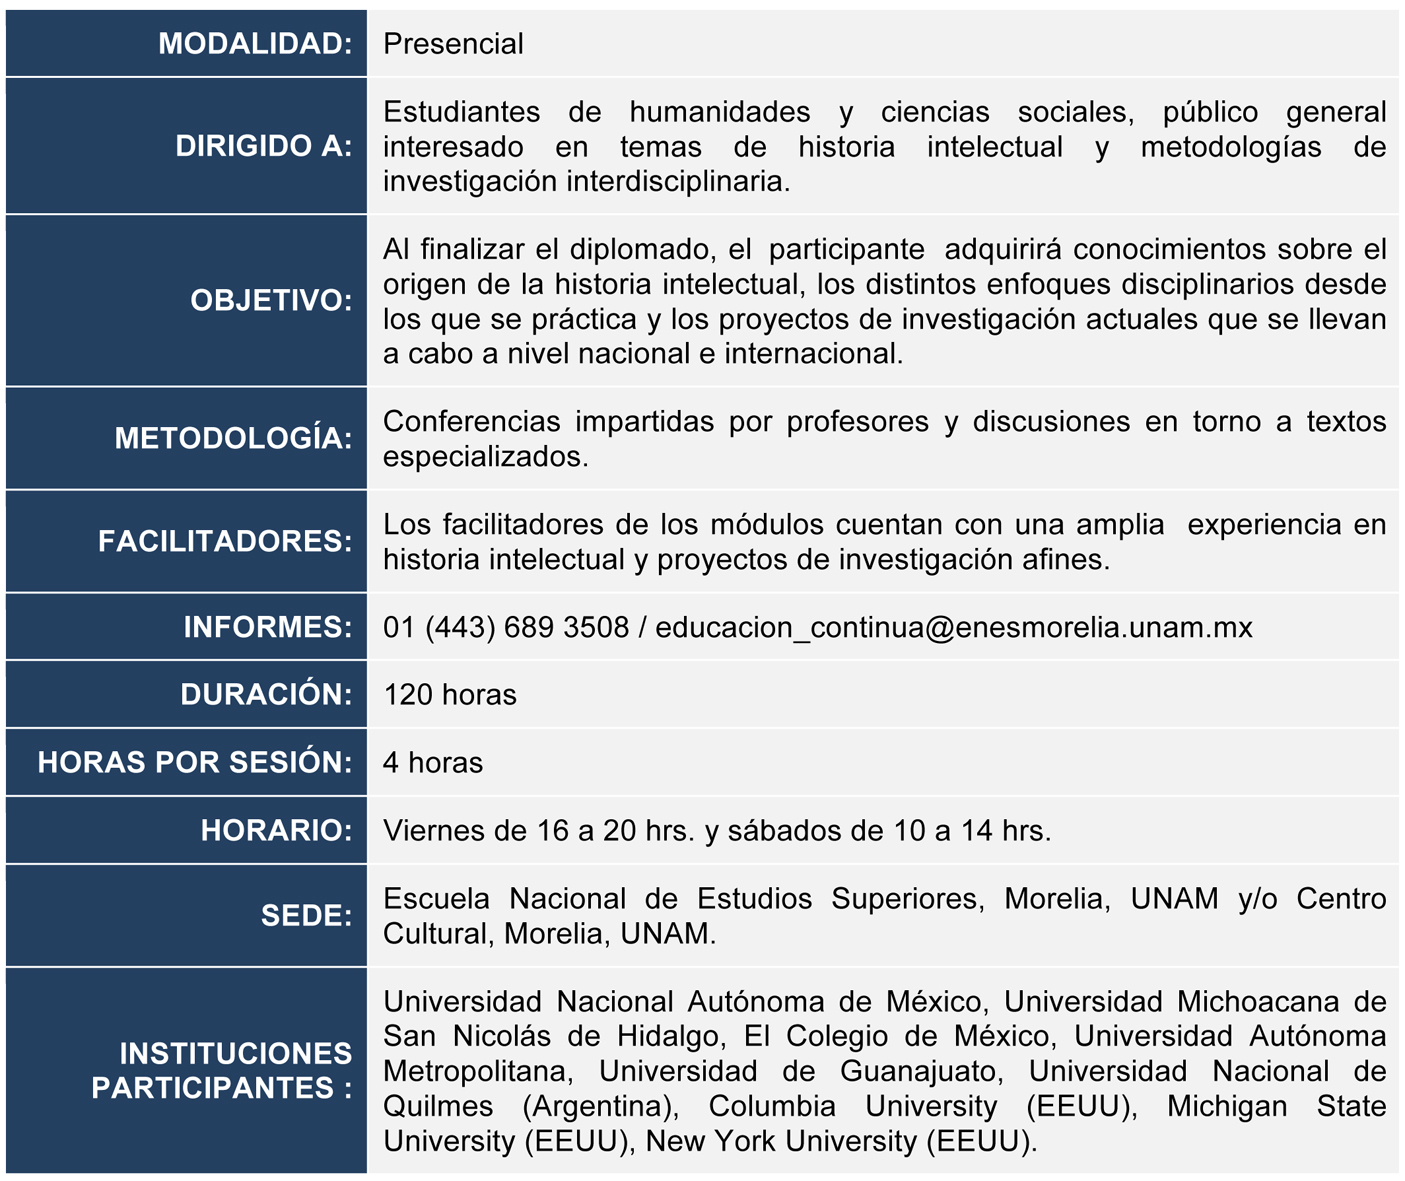 Microsoft Word - Diplomado HI - INFORMACIO_N PAGI_NA ENES.docx